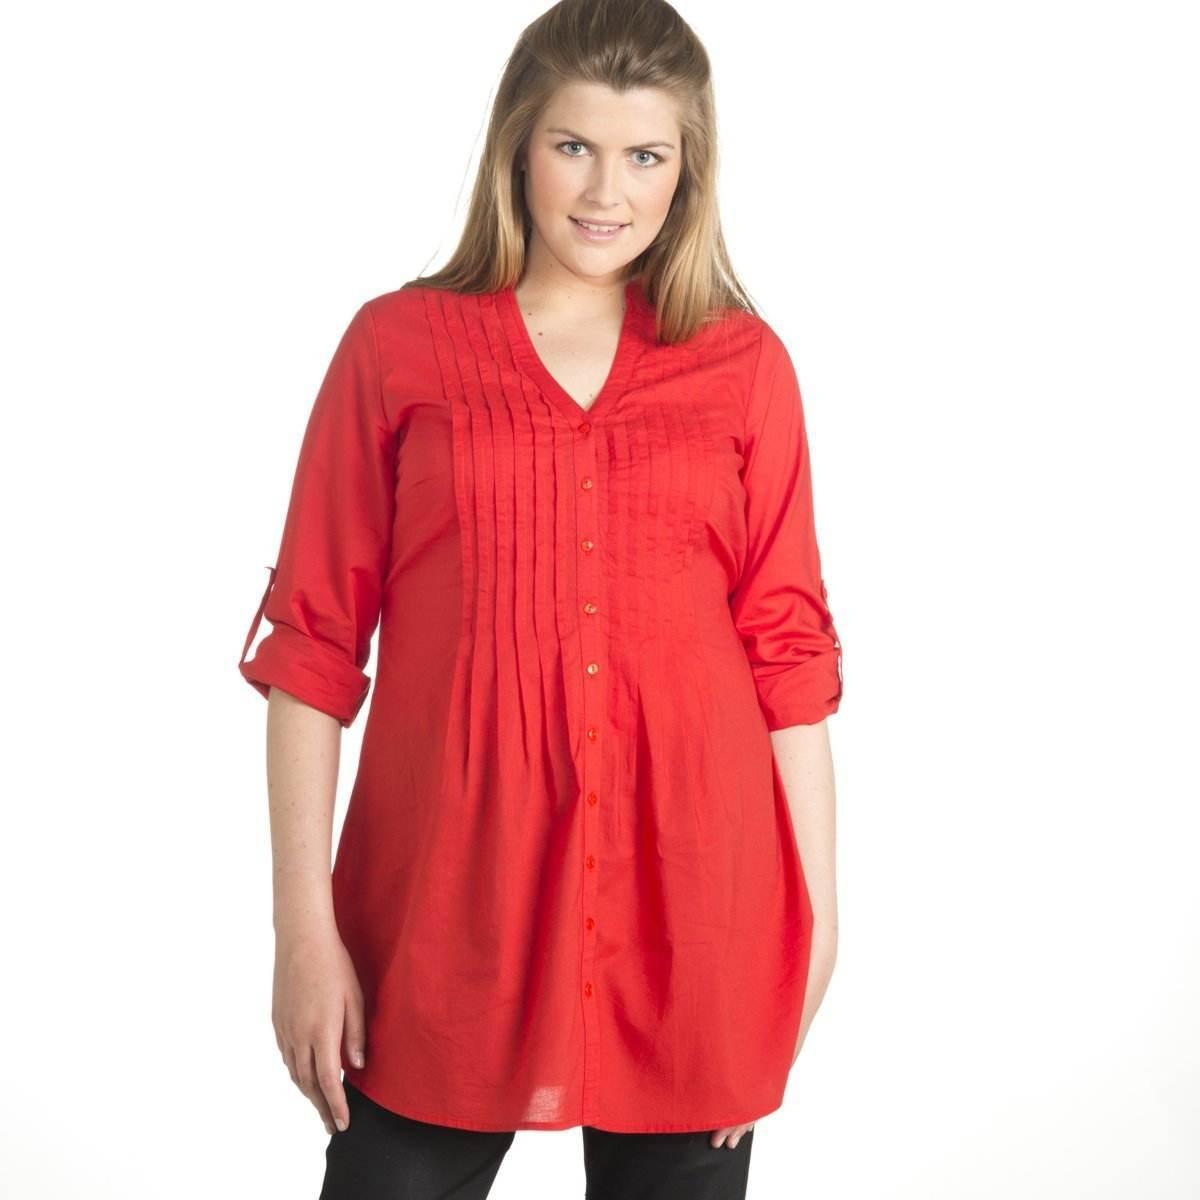 Camisas elegantes y modernas para gorditas